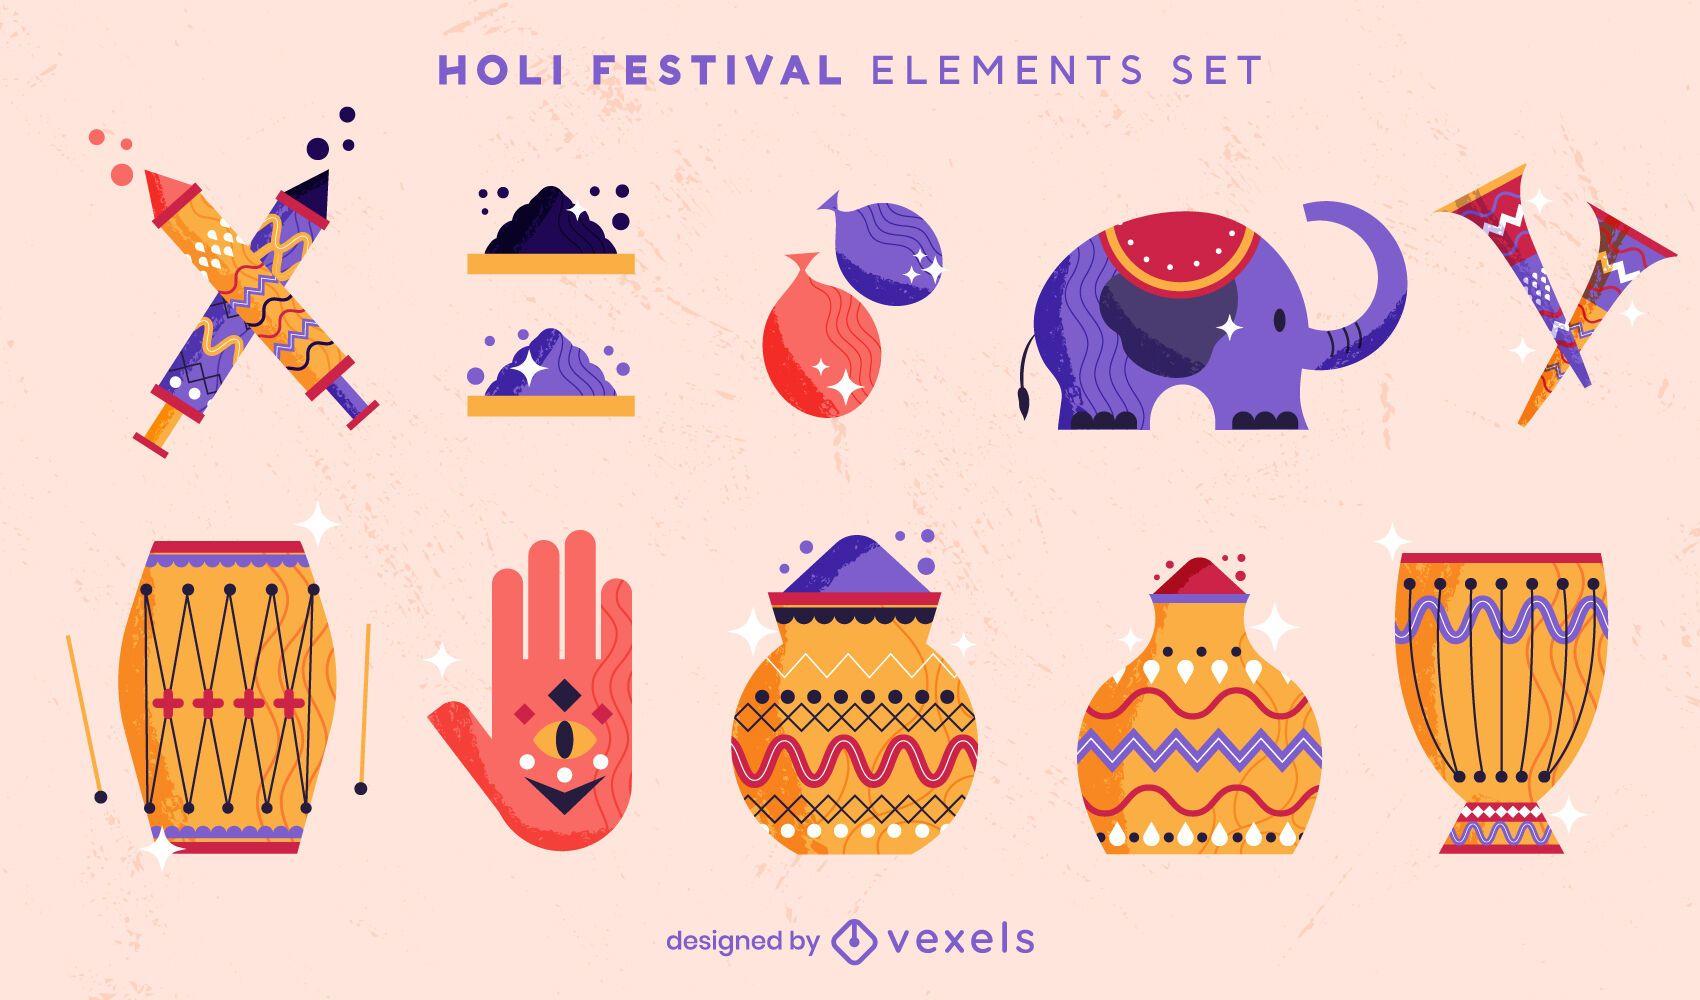 Holi festival elements vector set